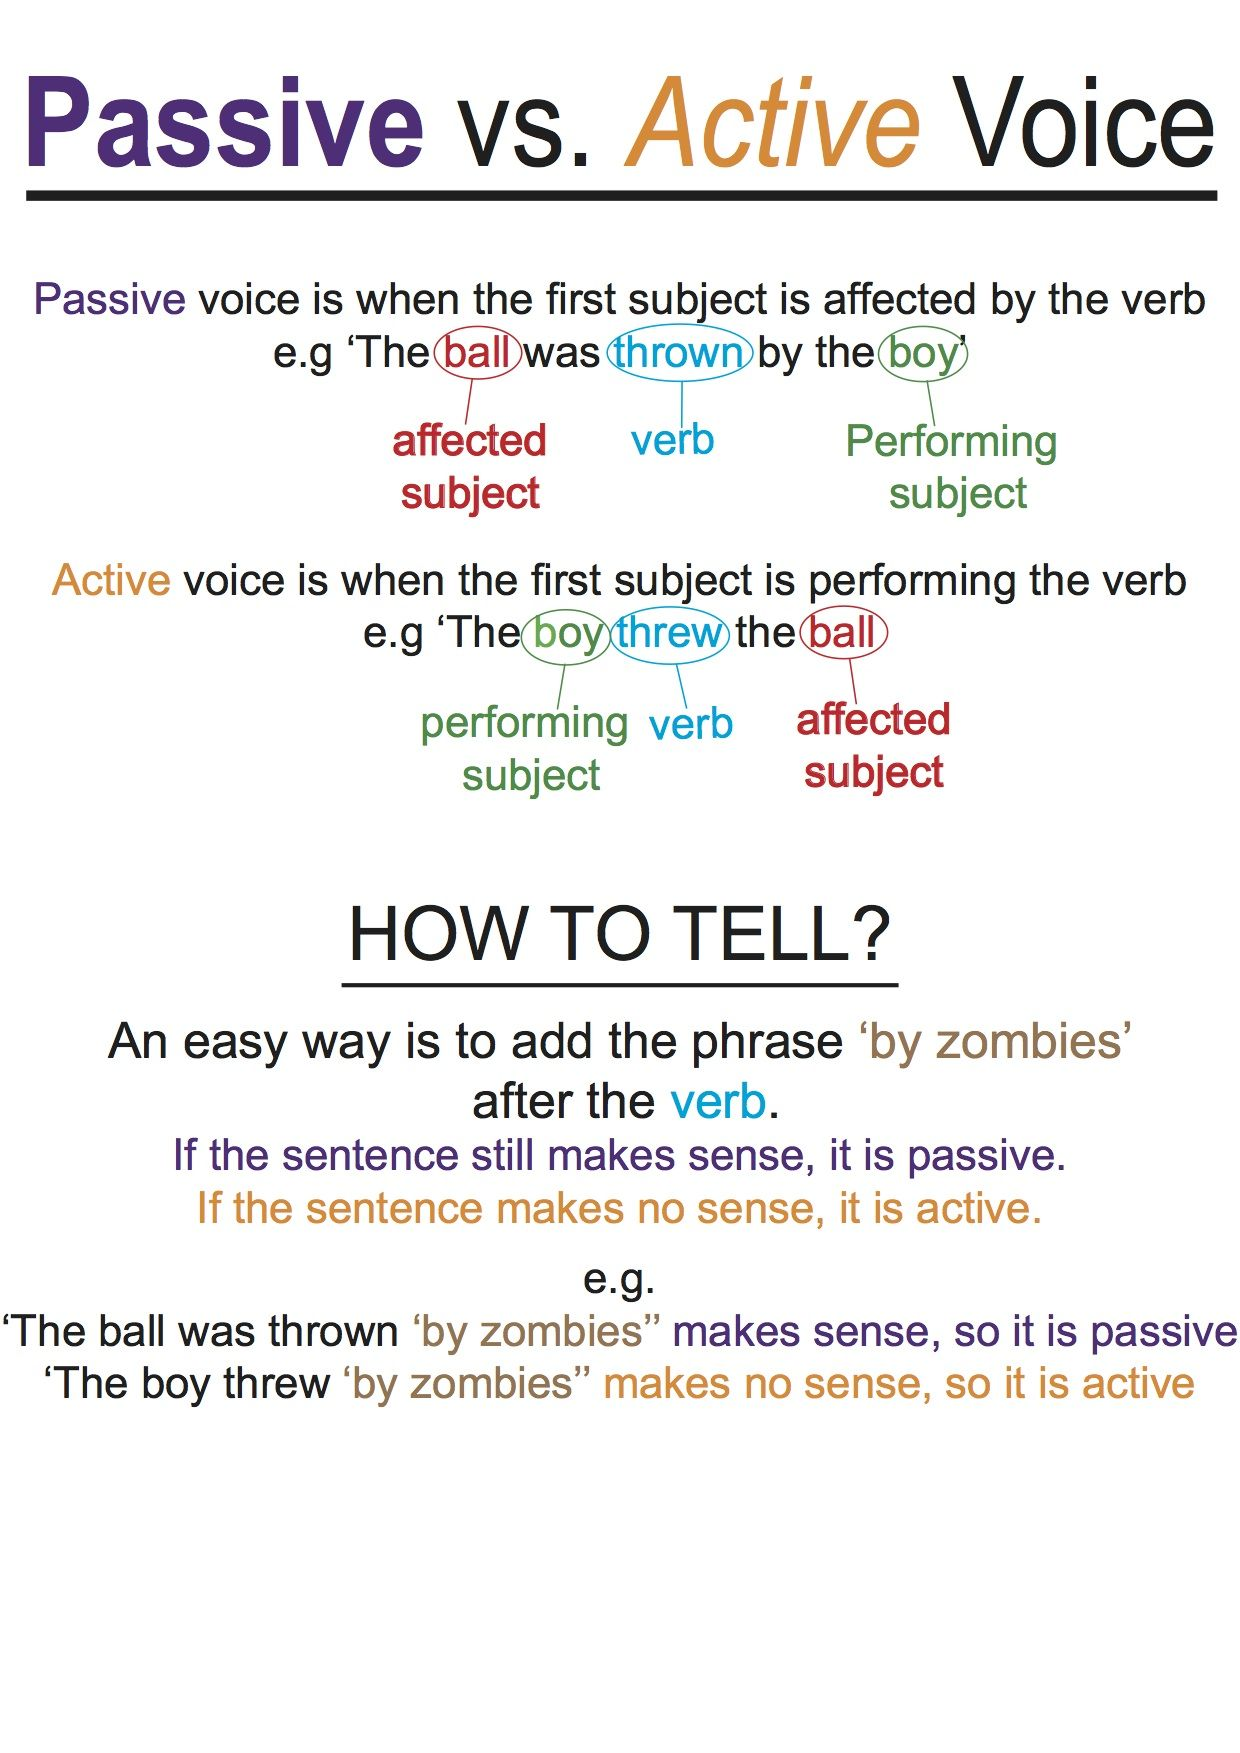 13 Active vs Passive ideas  passive, active and passive voice